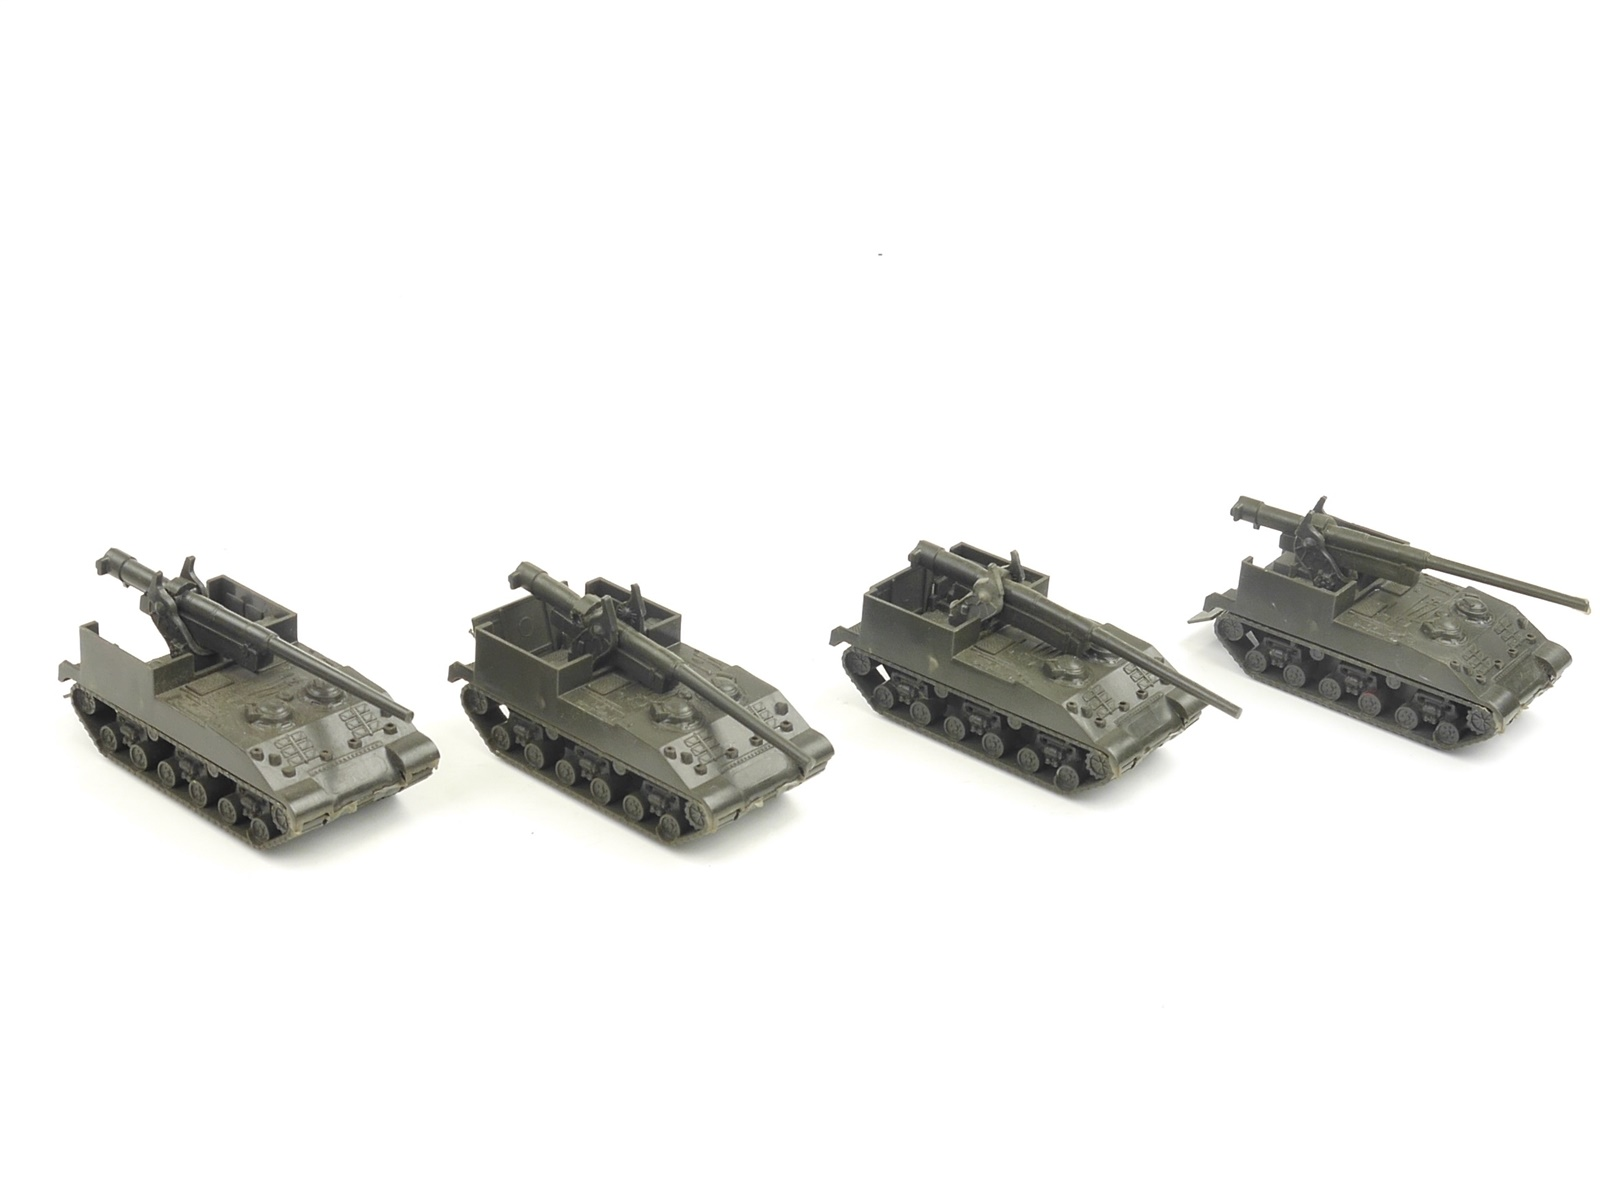 E135 Roco Minitanks H0 104 4x Militärfahrzeug Selbstfahrlafette M-40 155MM 1:87